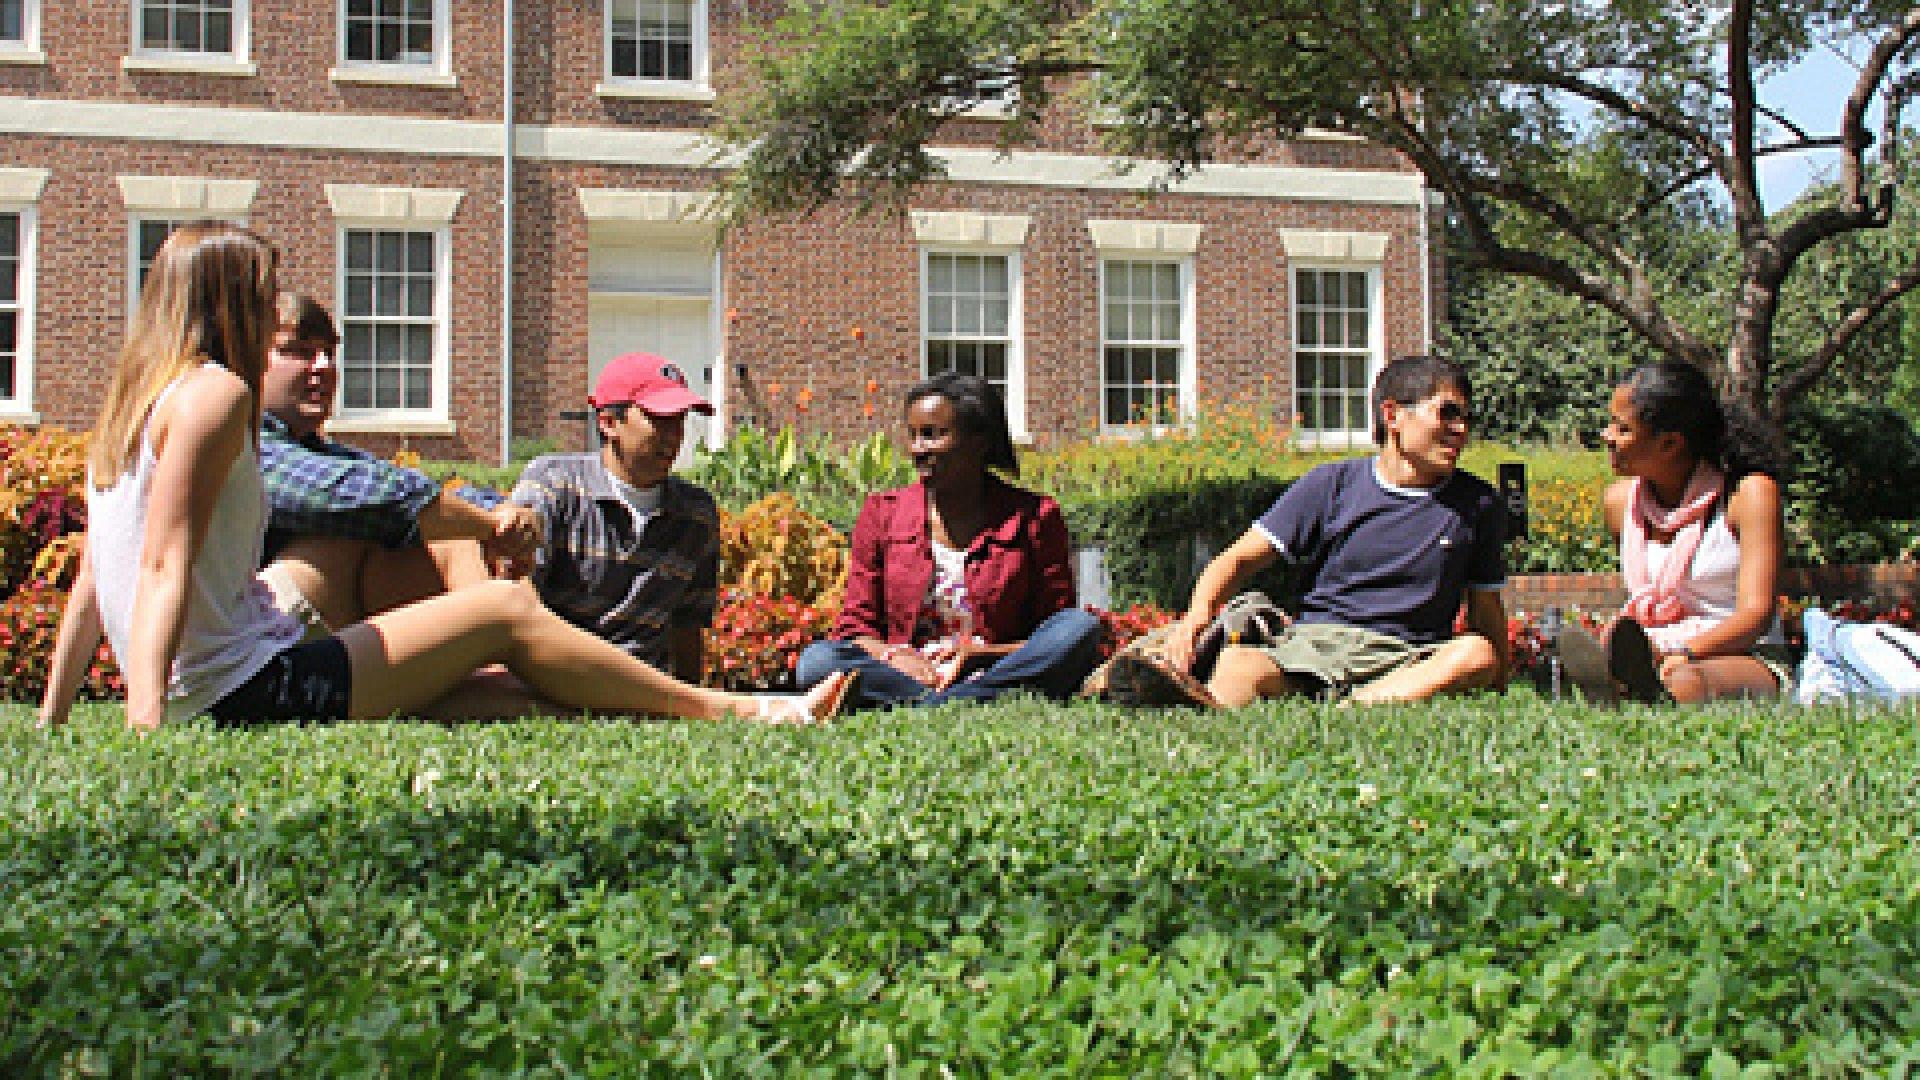 Students UGA campus